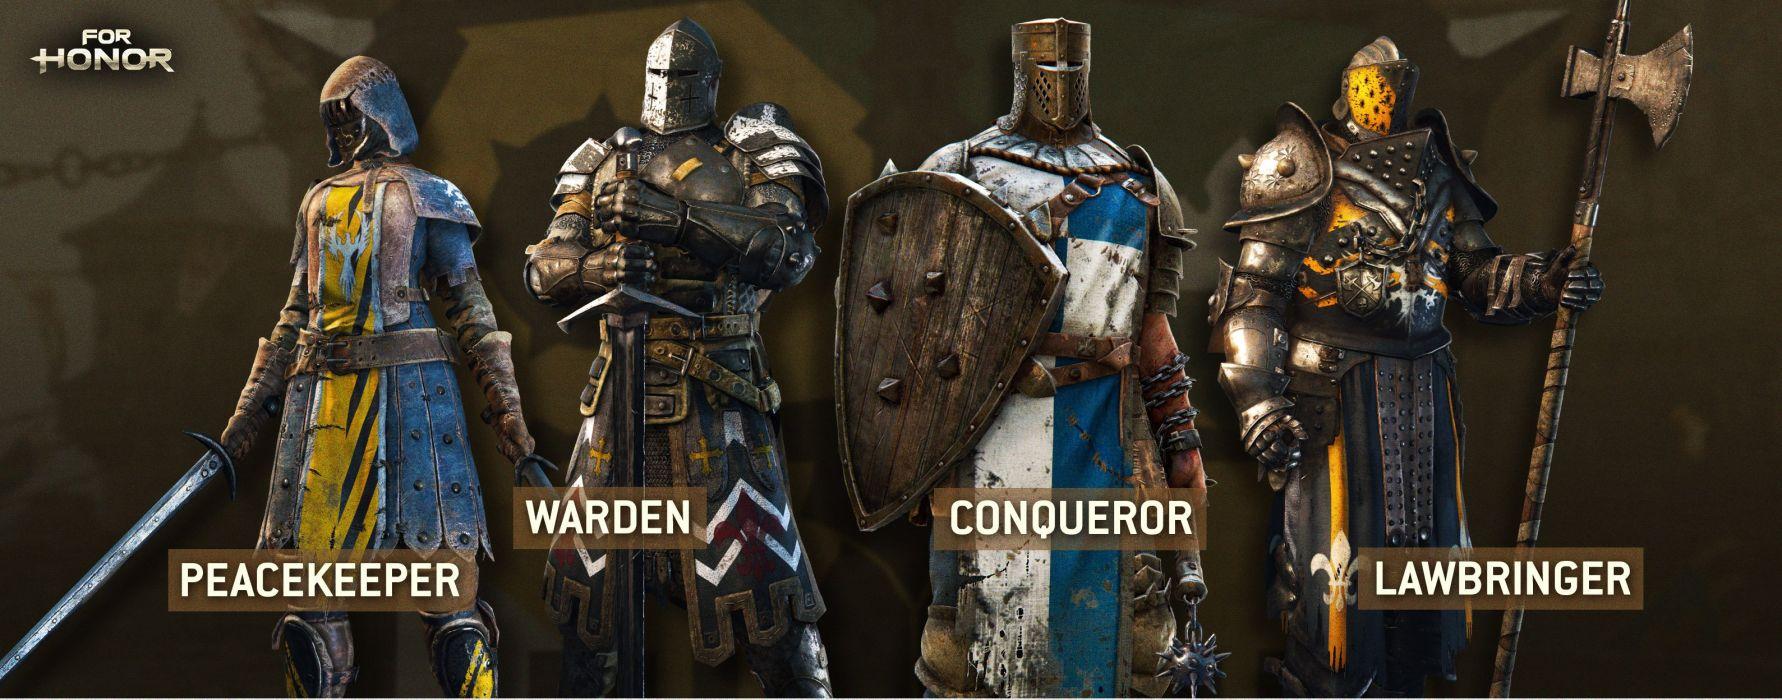 medieval knight vs samurai